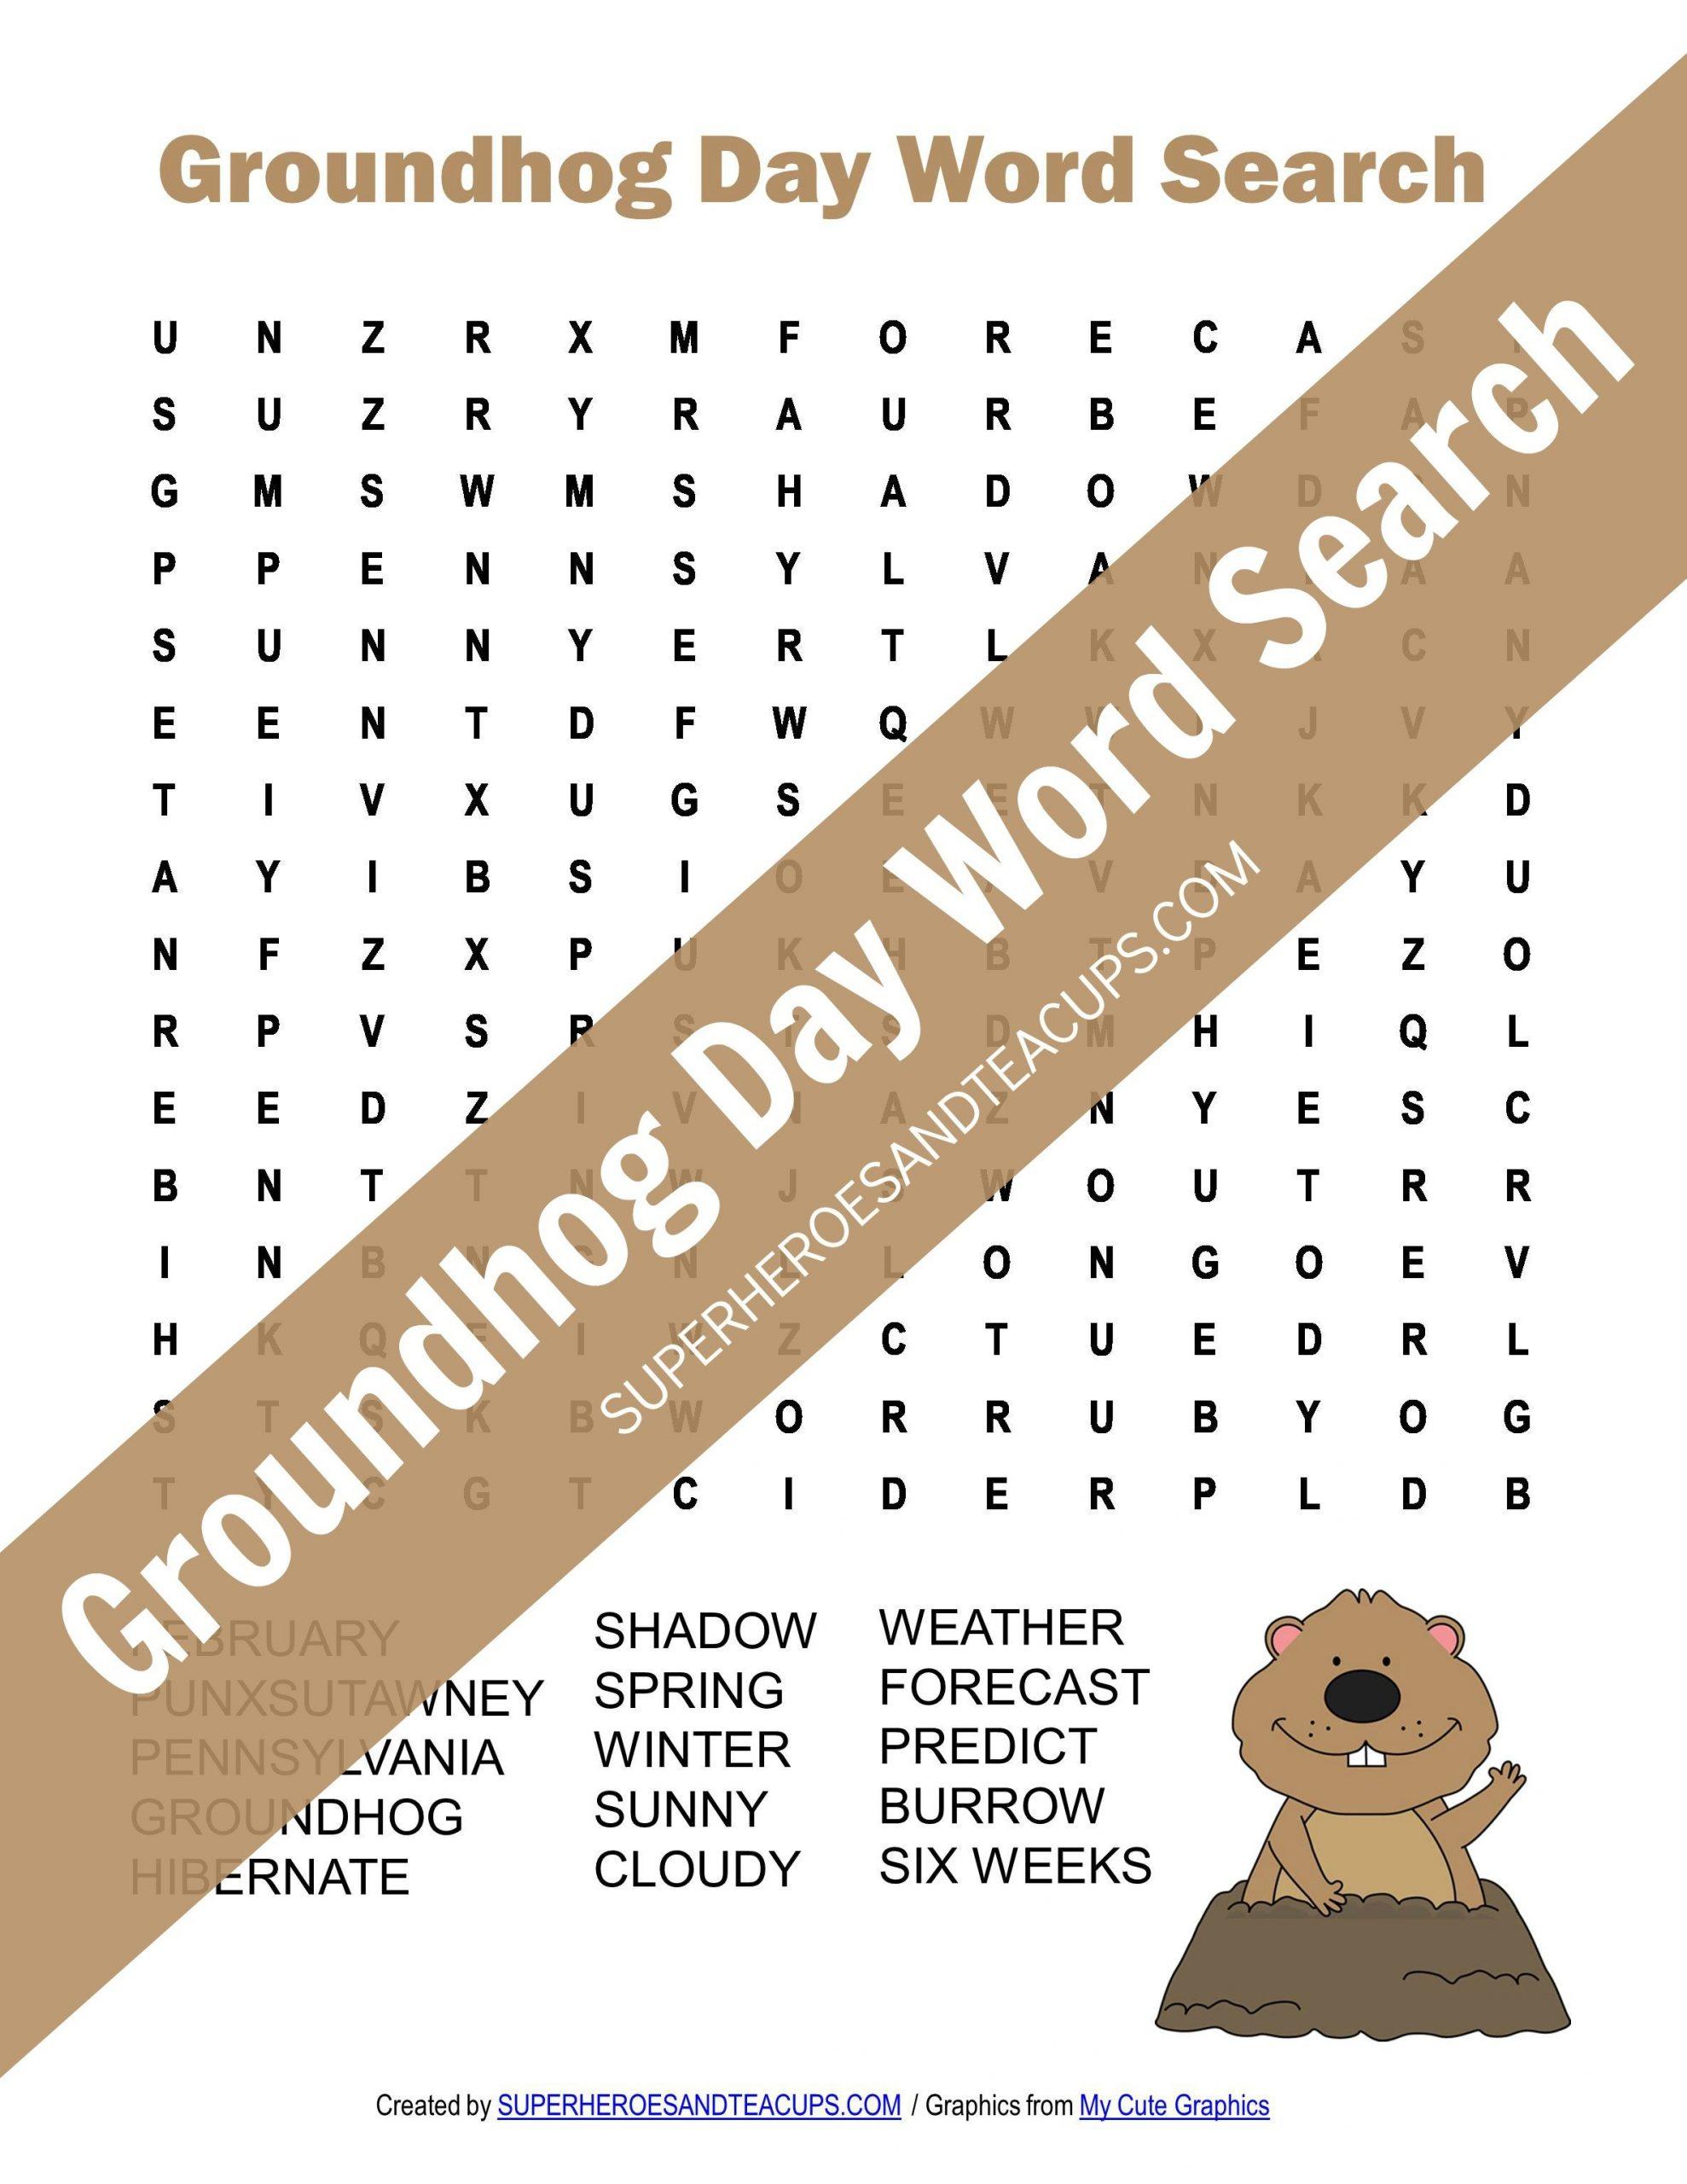 Groundhog Day Word Search Free Printable